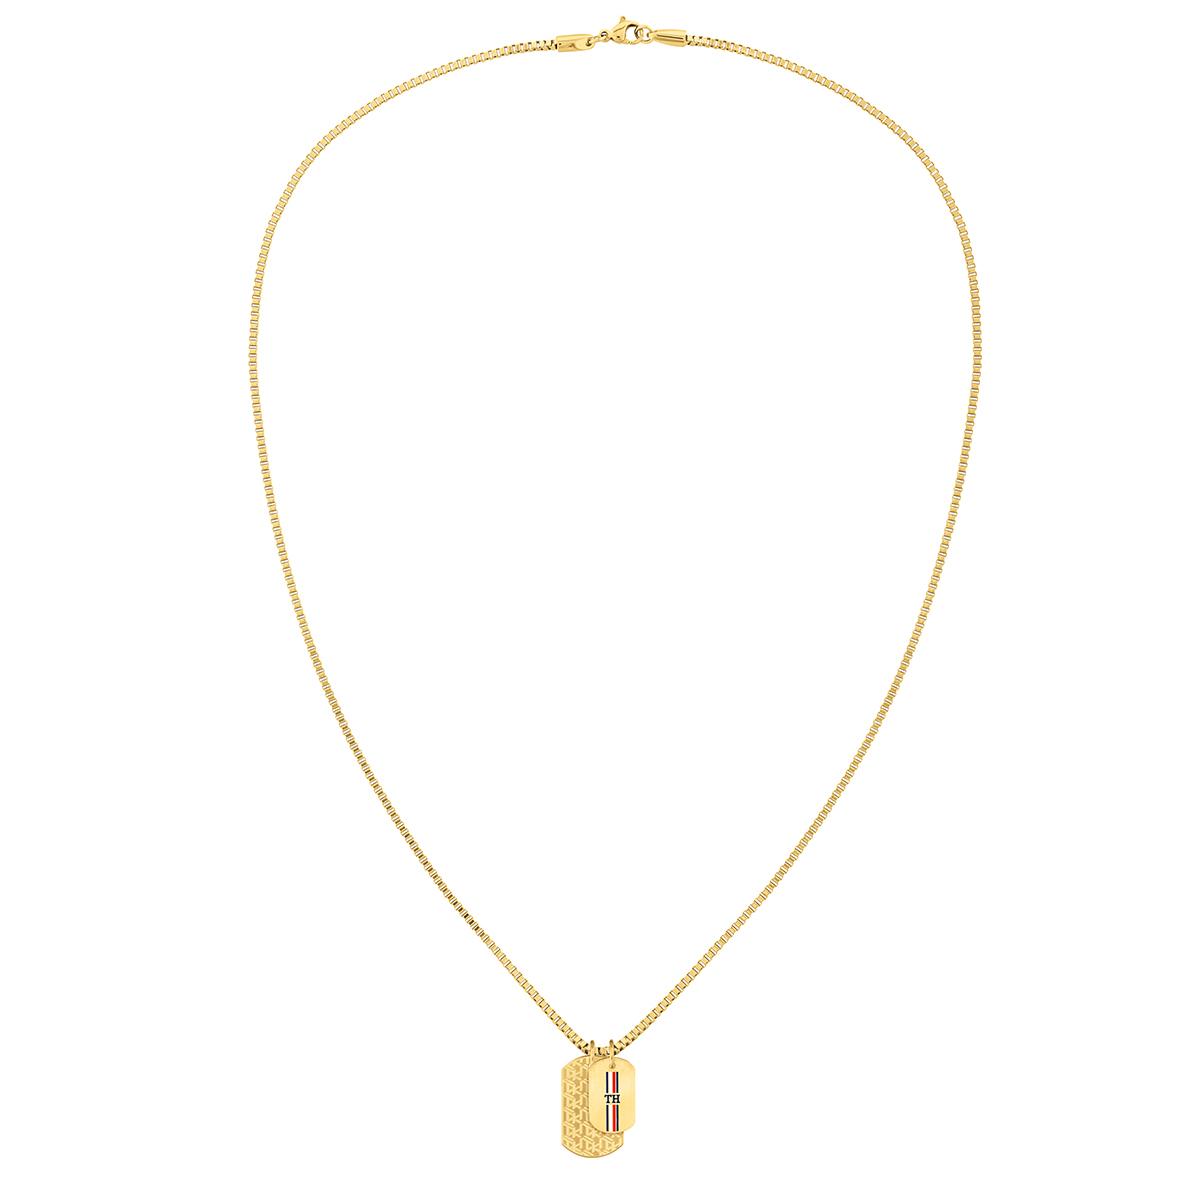 Denim collier TJ2790211 (Taille: 60cm) - Tommy hilfiger - Modalova